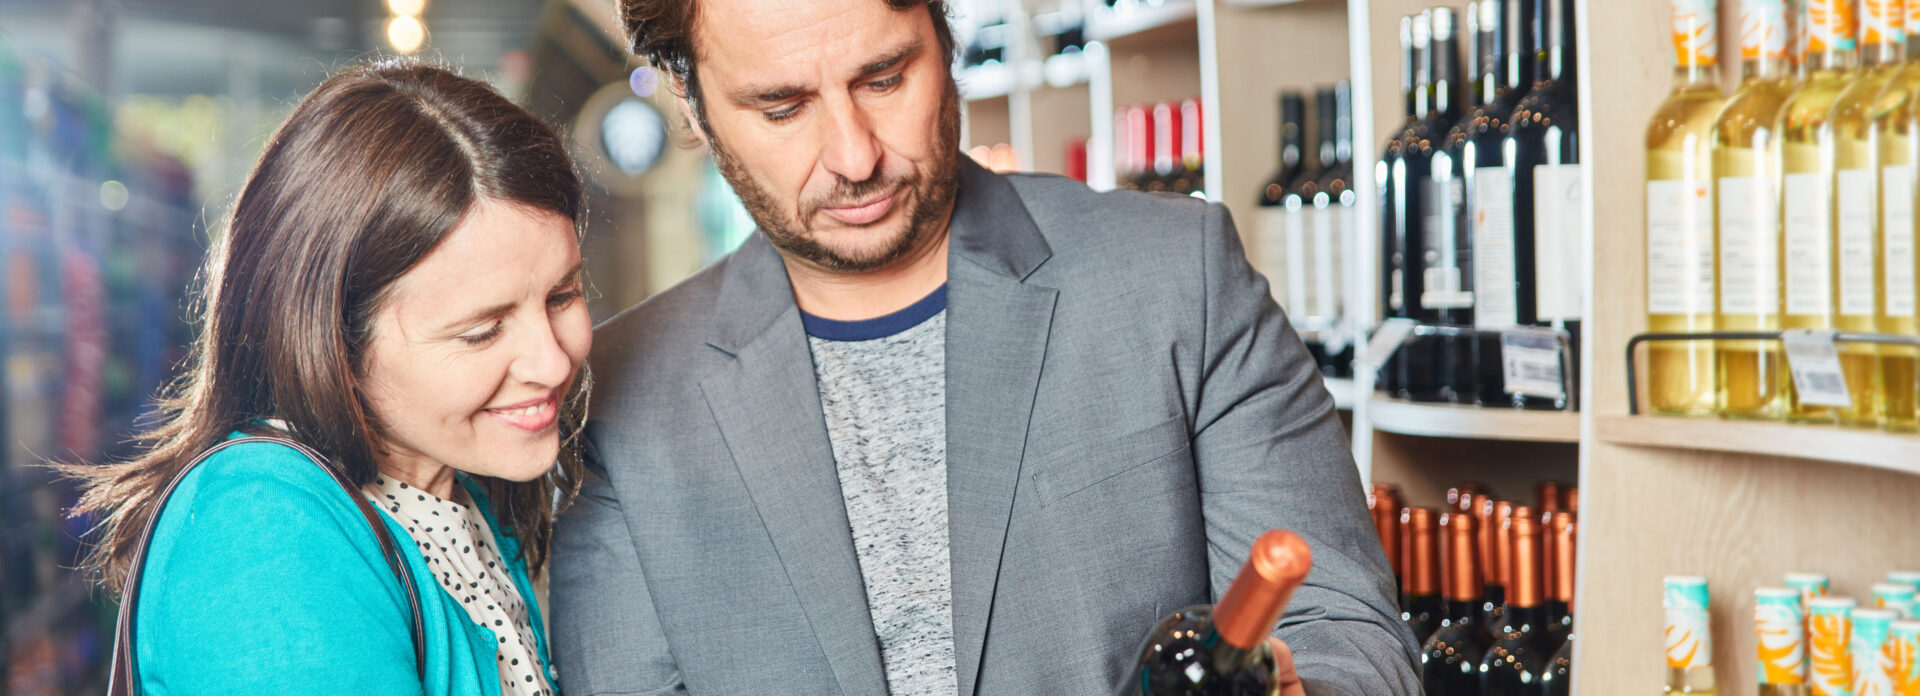 alkohol priser Paris Frankrike vin ol sprit brennevin